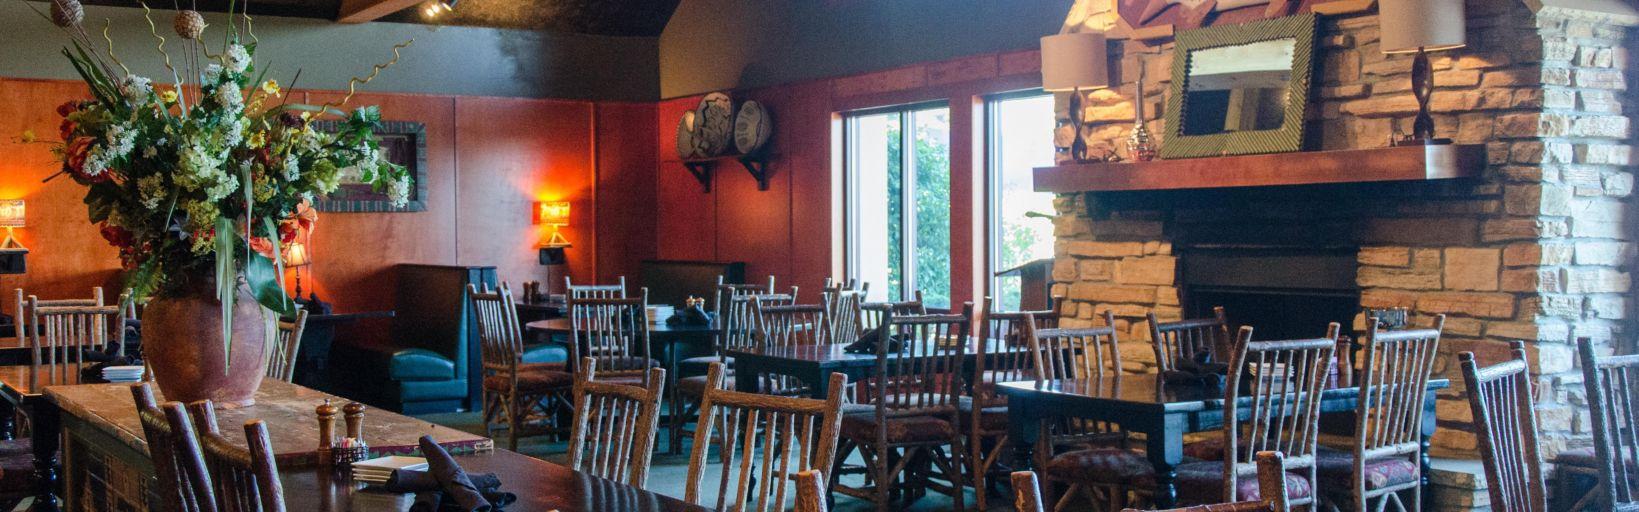 Dining At Thunder Bay Restaurant In Holiday Inn Pewaukee